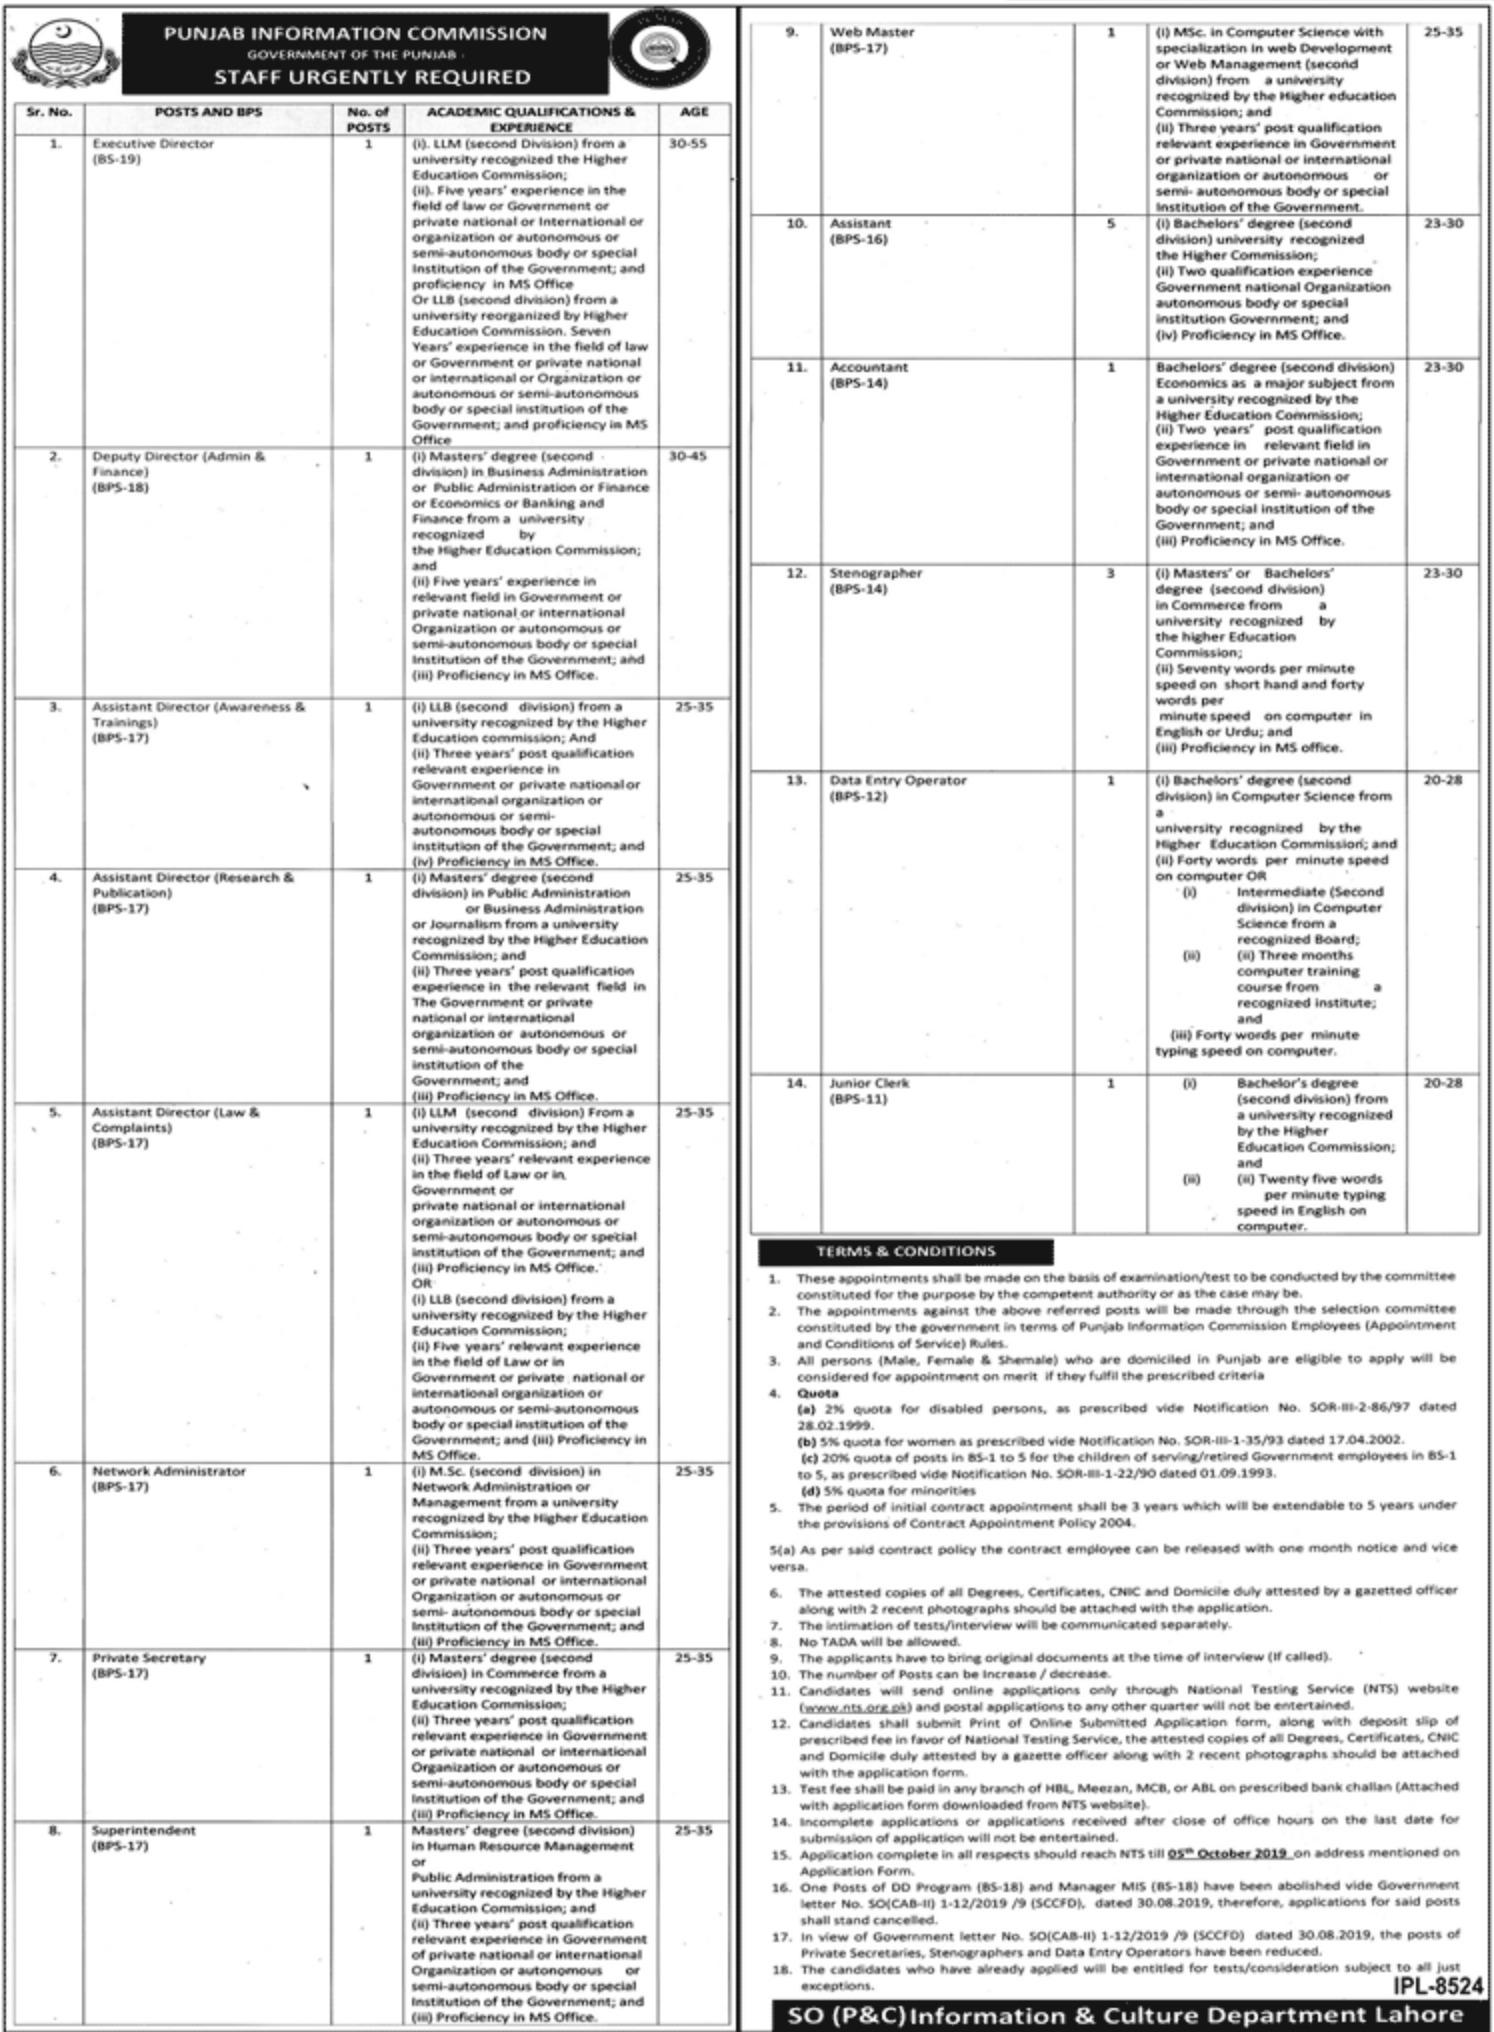 Punjab Information Commission NTS Jobs 2019 Application Form Roll No Slip